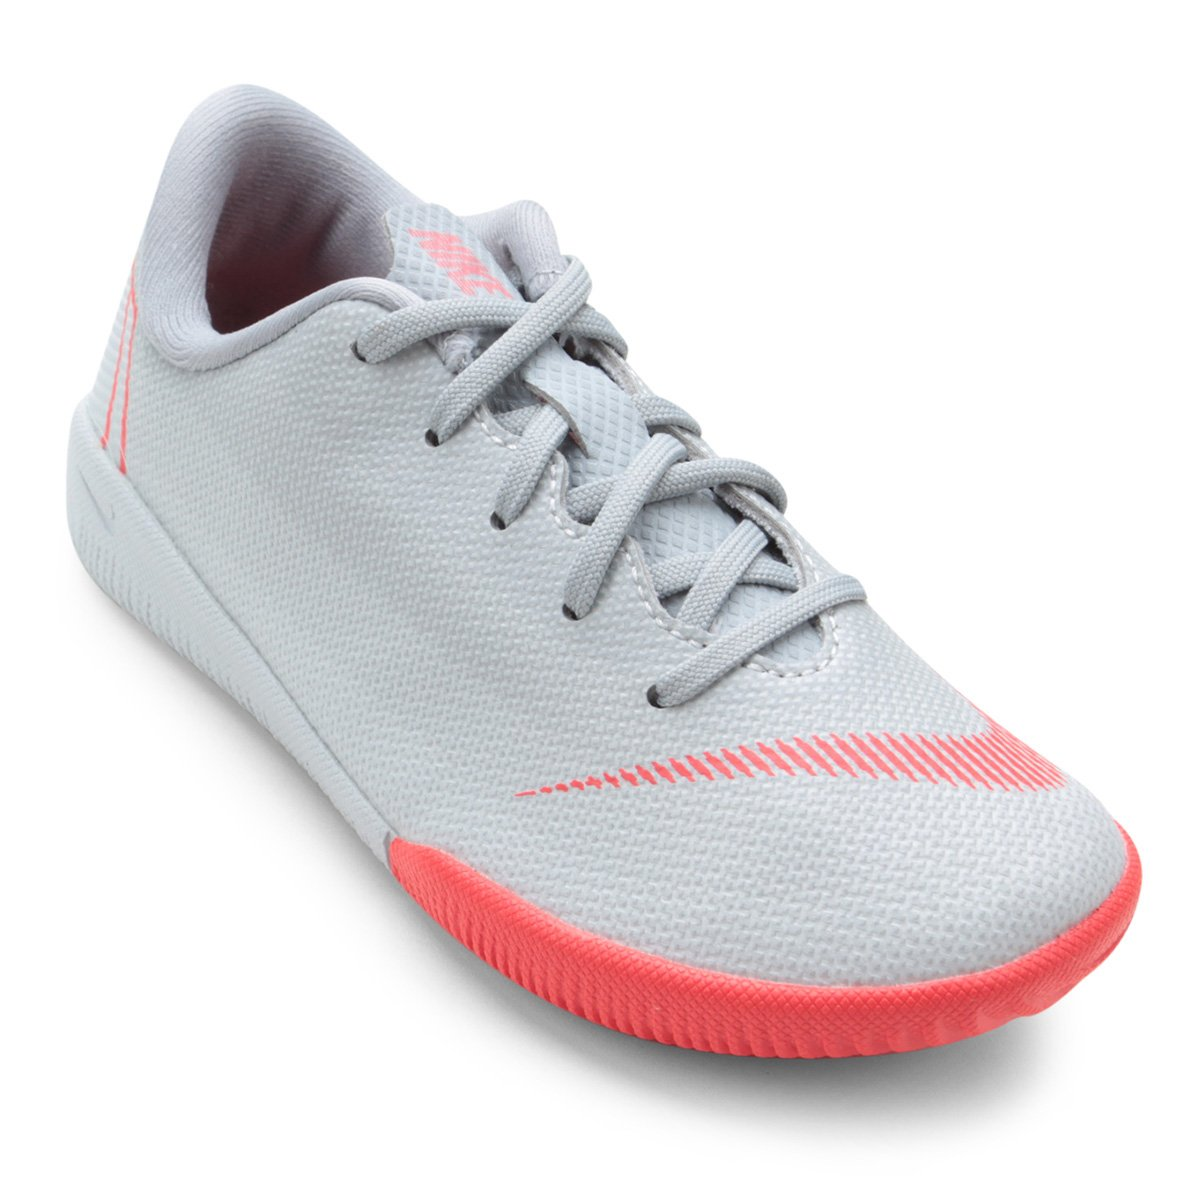 e2430facf7 Chuteira Futsal Infantil Nike Mercurial Vapor 12 Academy - Cinza e ...